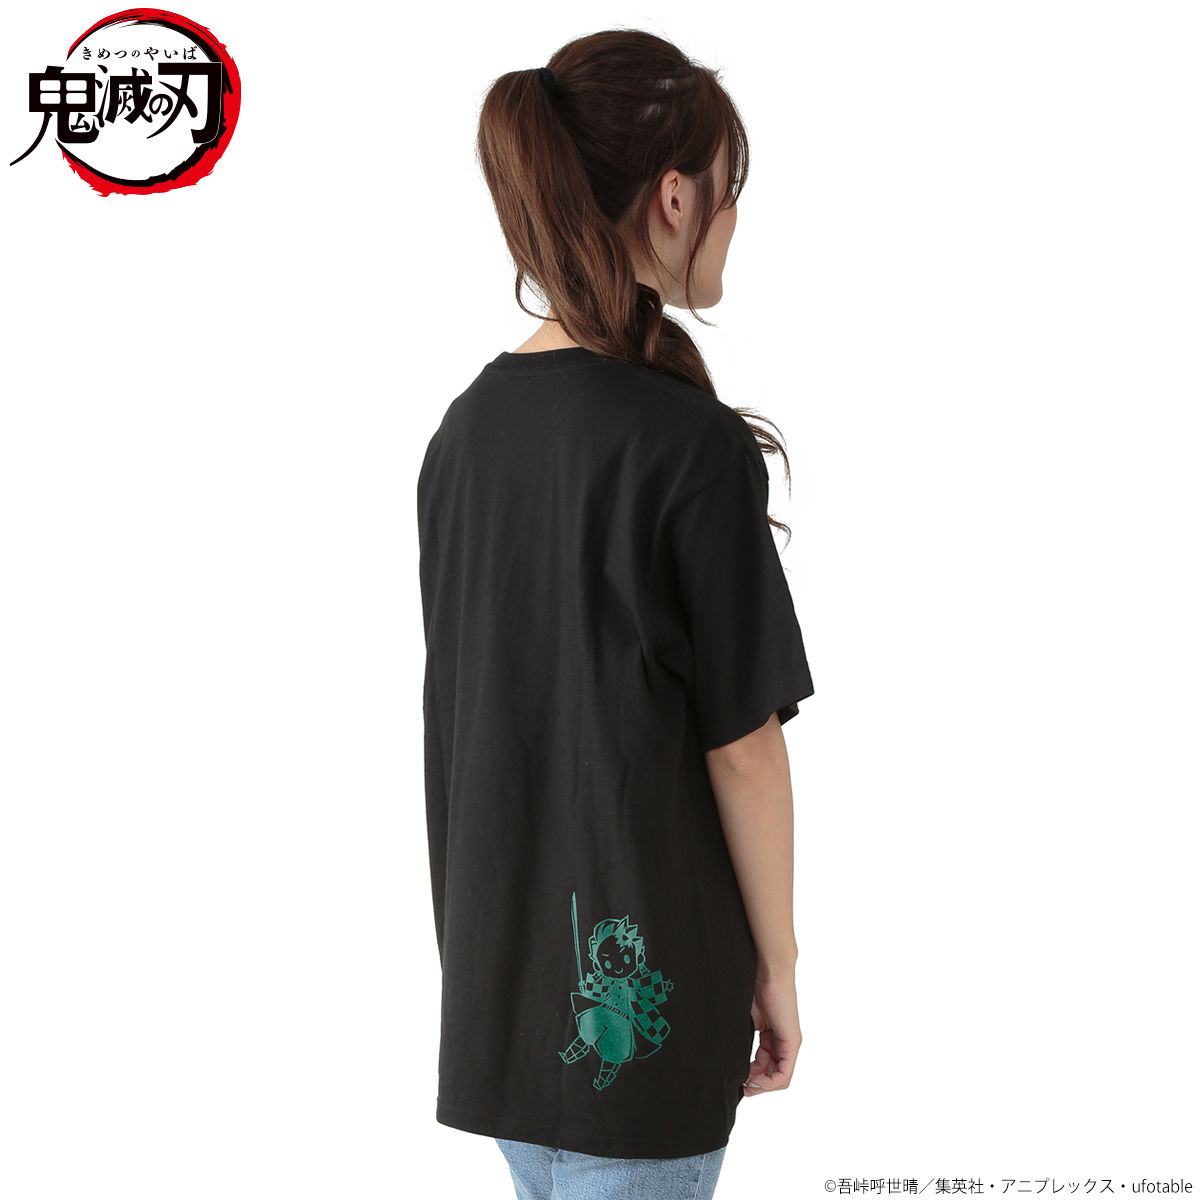 Super-Deformed Characters Black Color T-shirt—Demon Slayer: Kimetsu no Yaiba